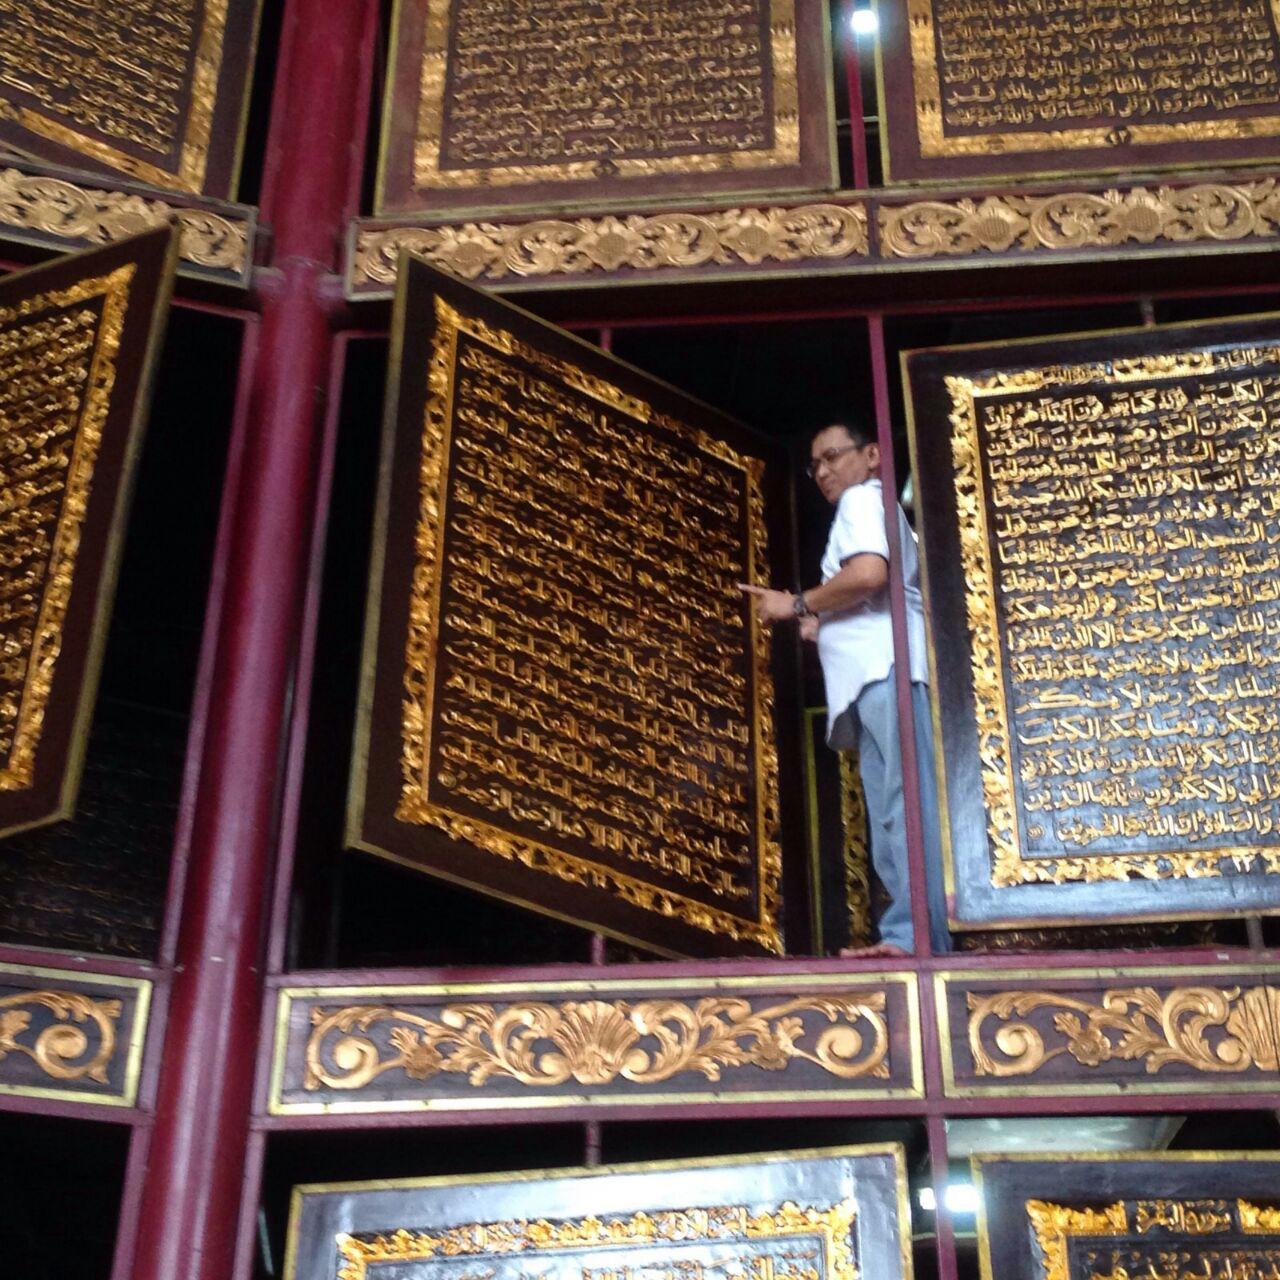 Museum Al Qura Akbar Obyek Wisata Religi Palembang Quran Qur